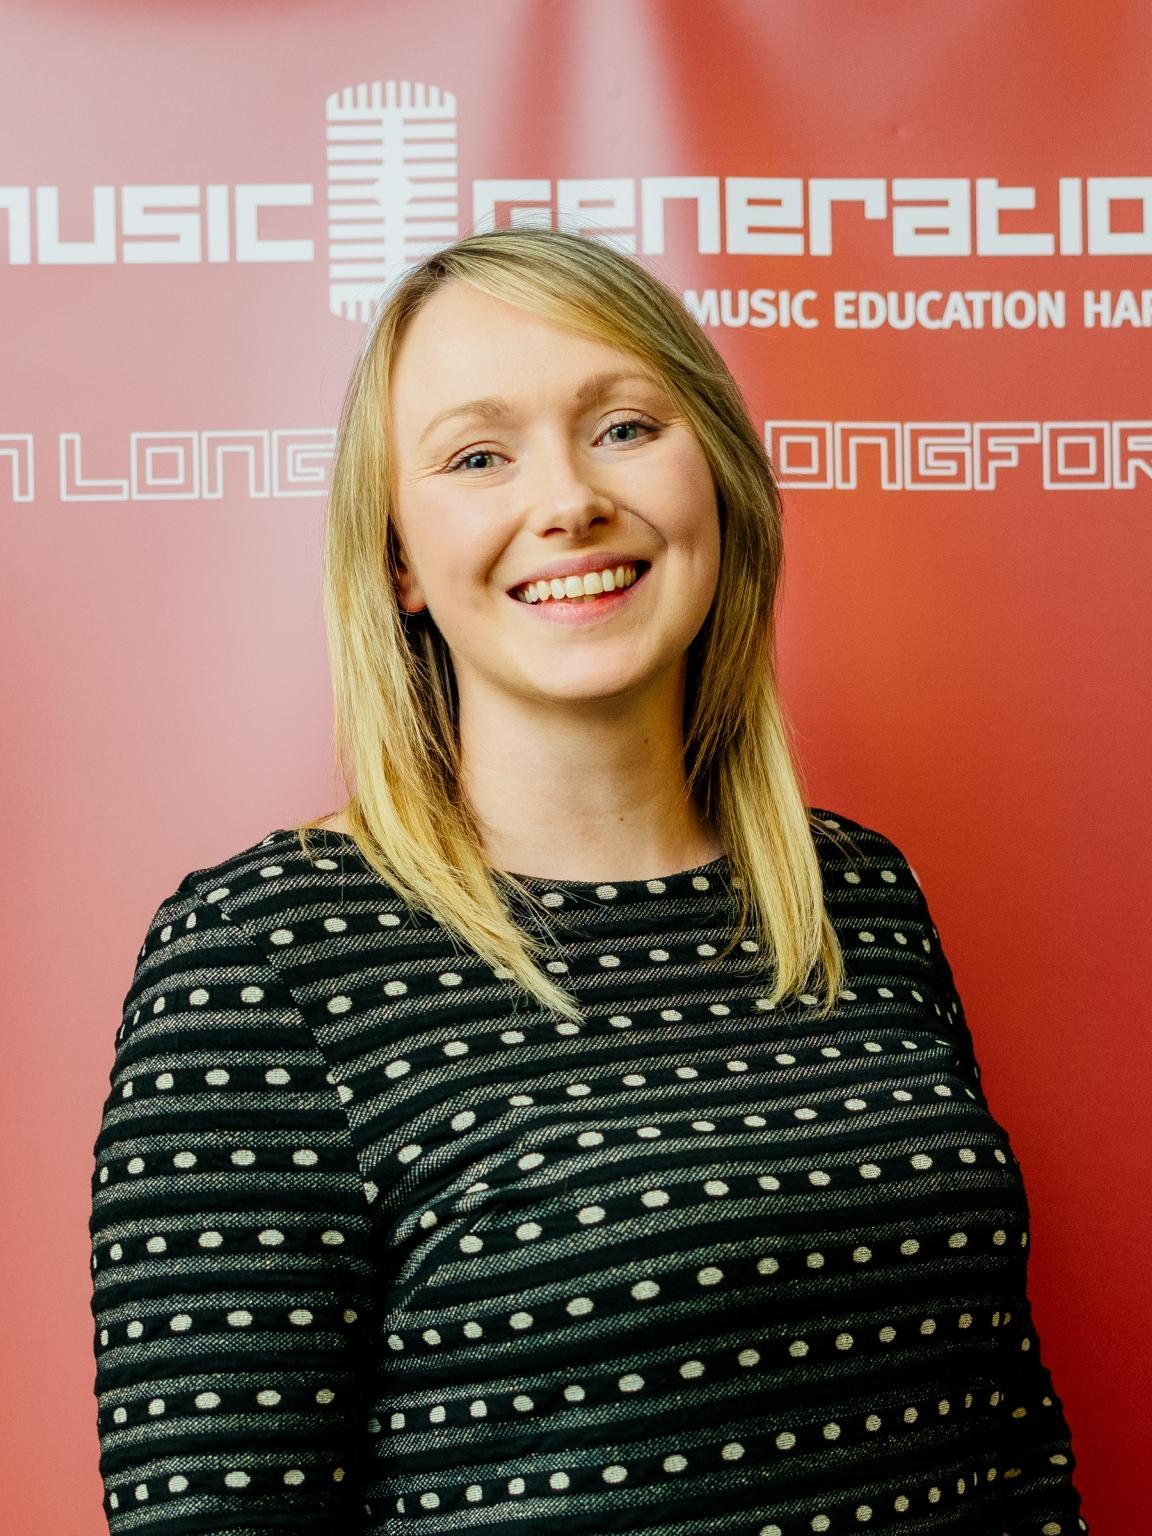 Information Technology Jobs Longford - brighten-up.uk